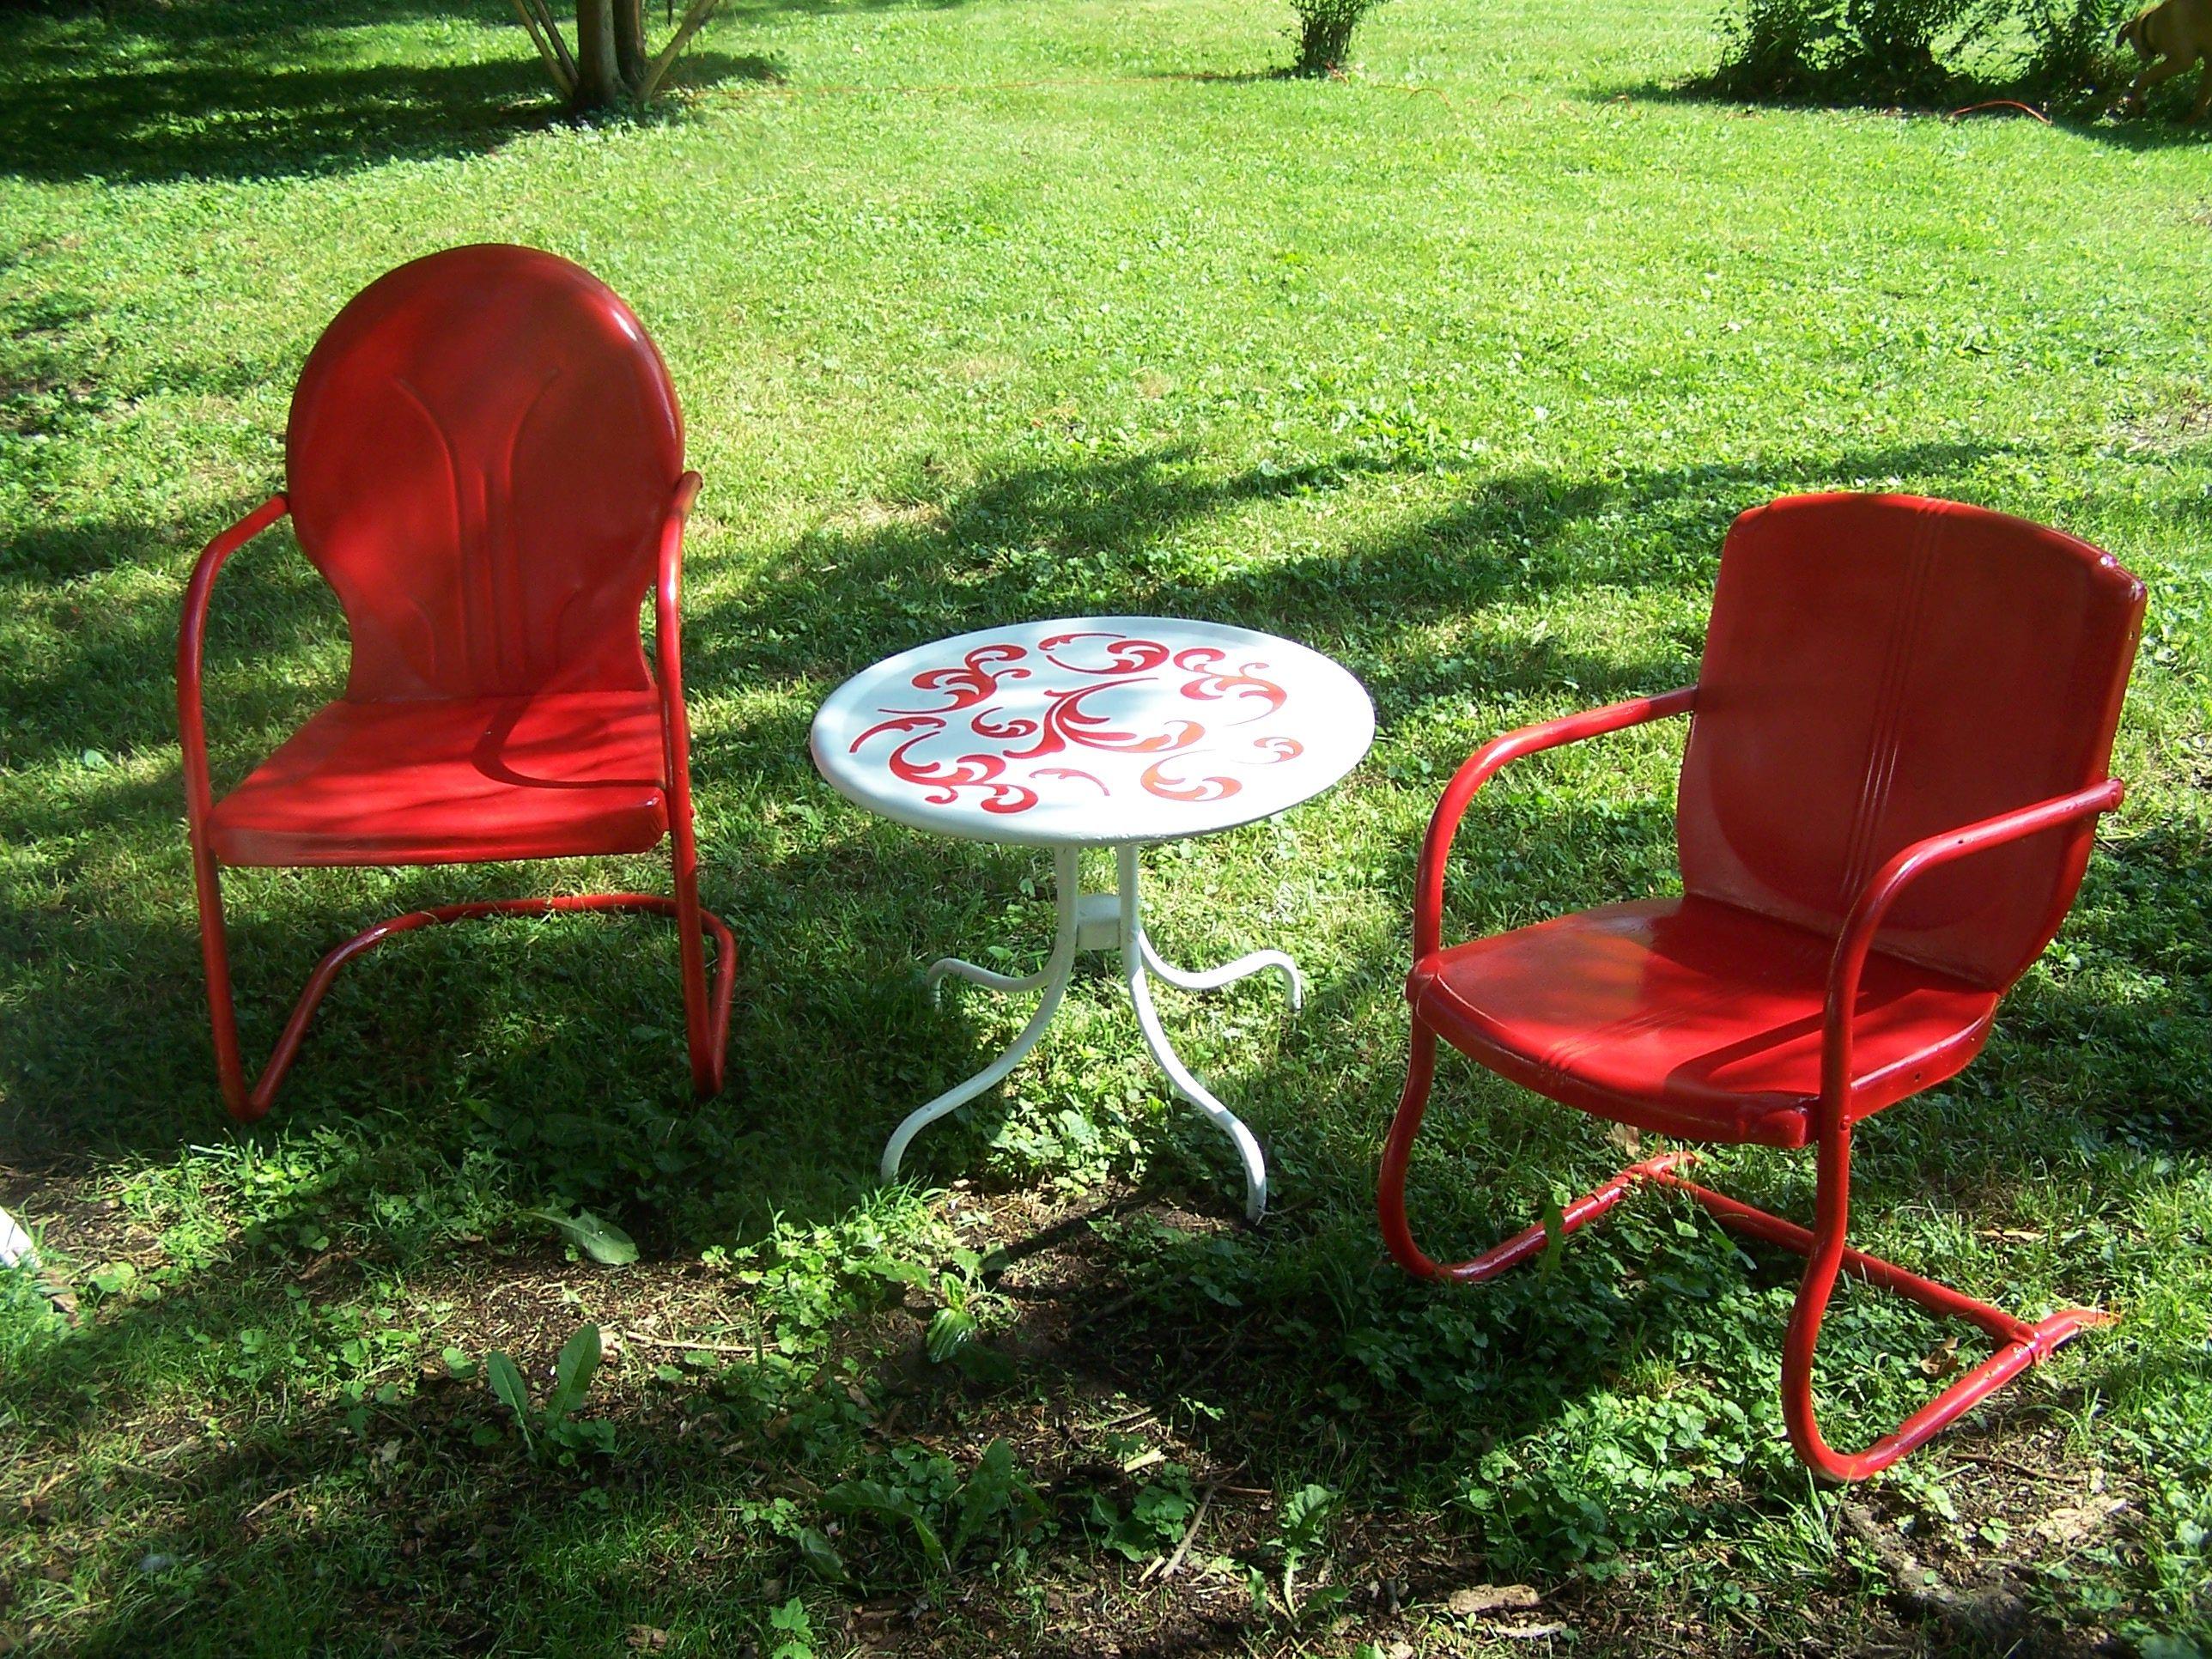 Genial Vintage Metal Lawn Chairs Shabby Chic Pinterest